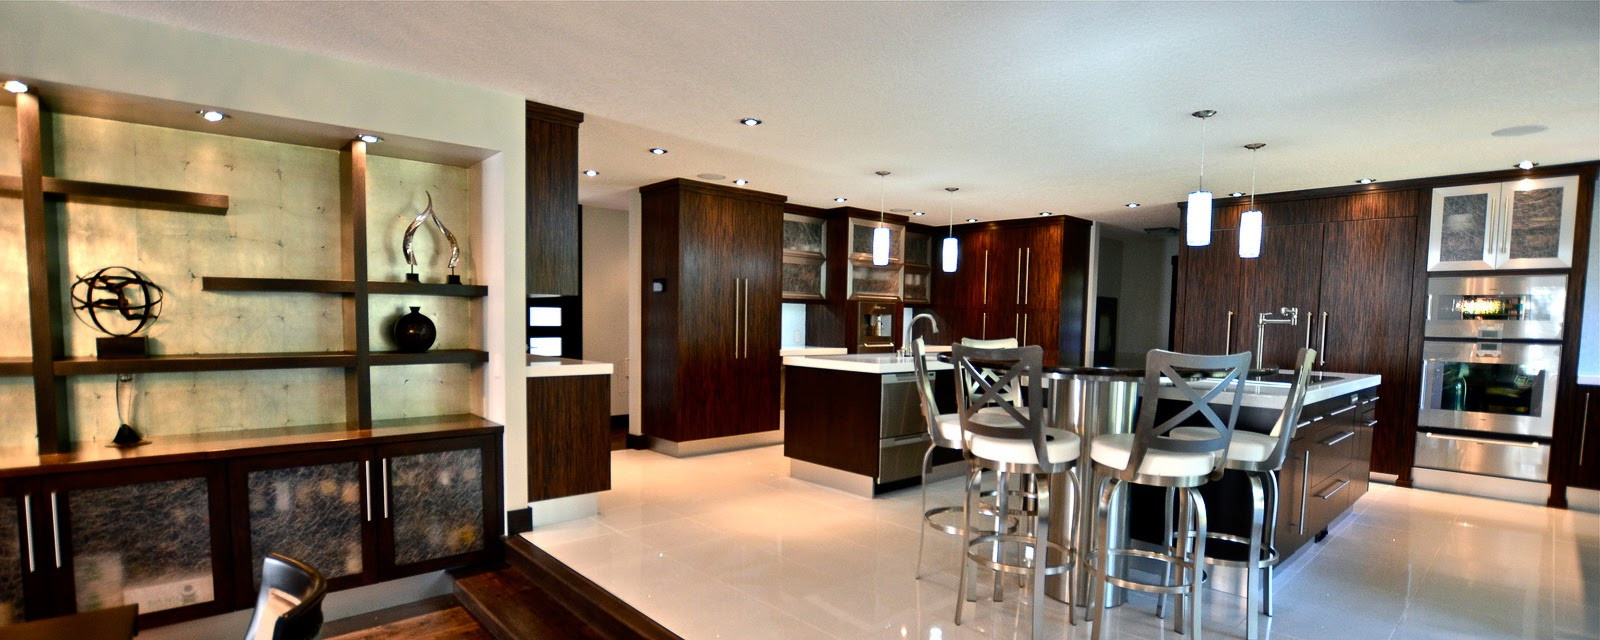 Clean and Sleek Renovation, Room Service Interiors, A Boutique Design Studio